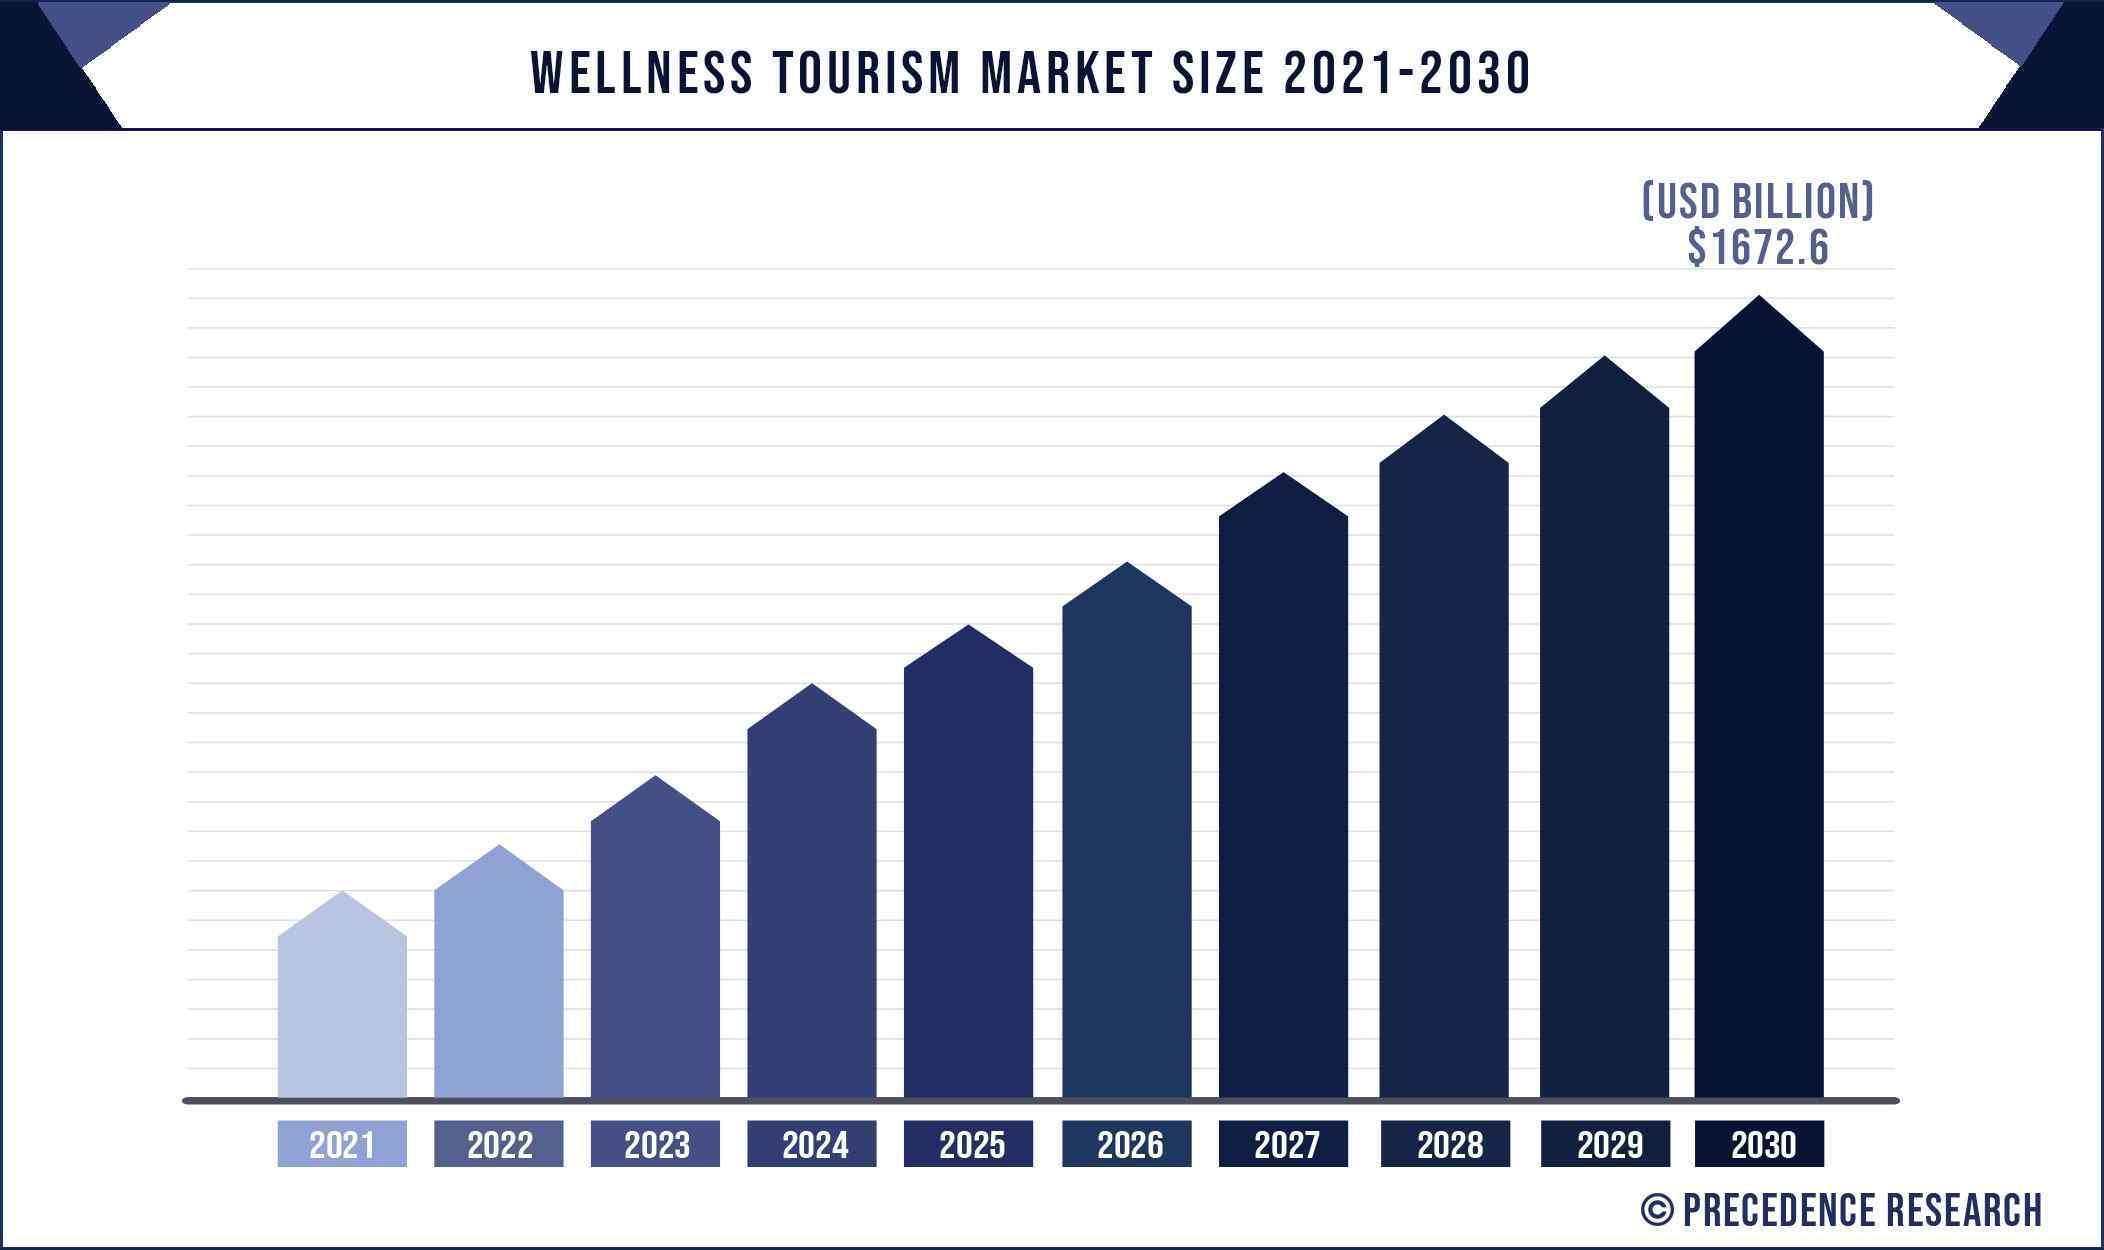 Wellness Tourism Market Size 2021 to 2030